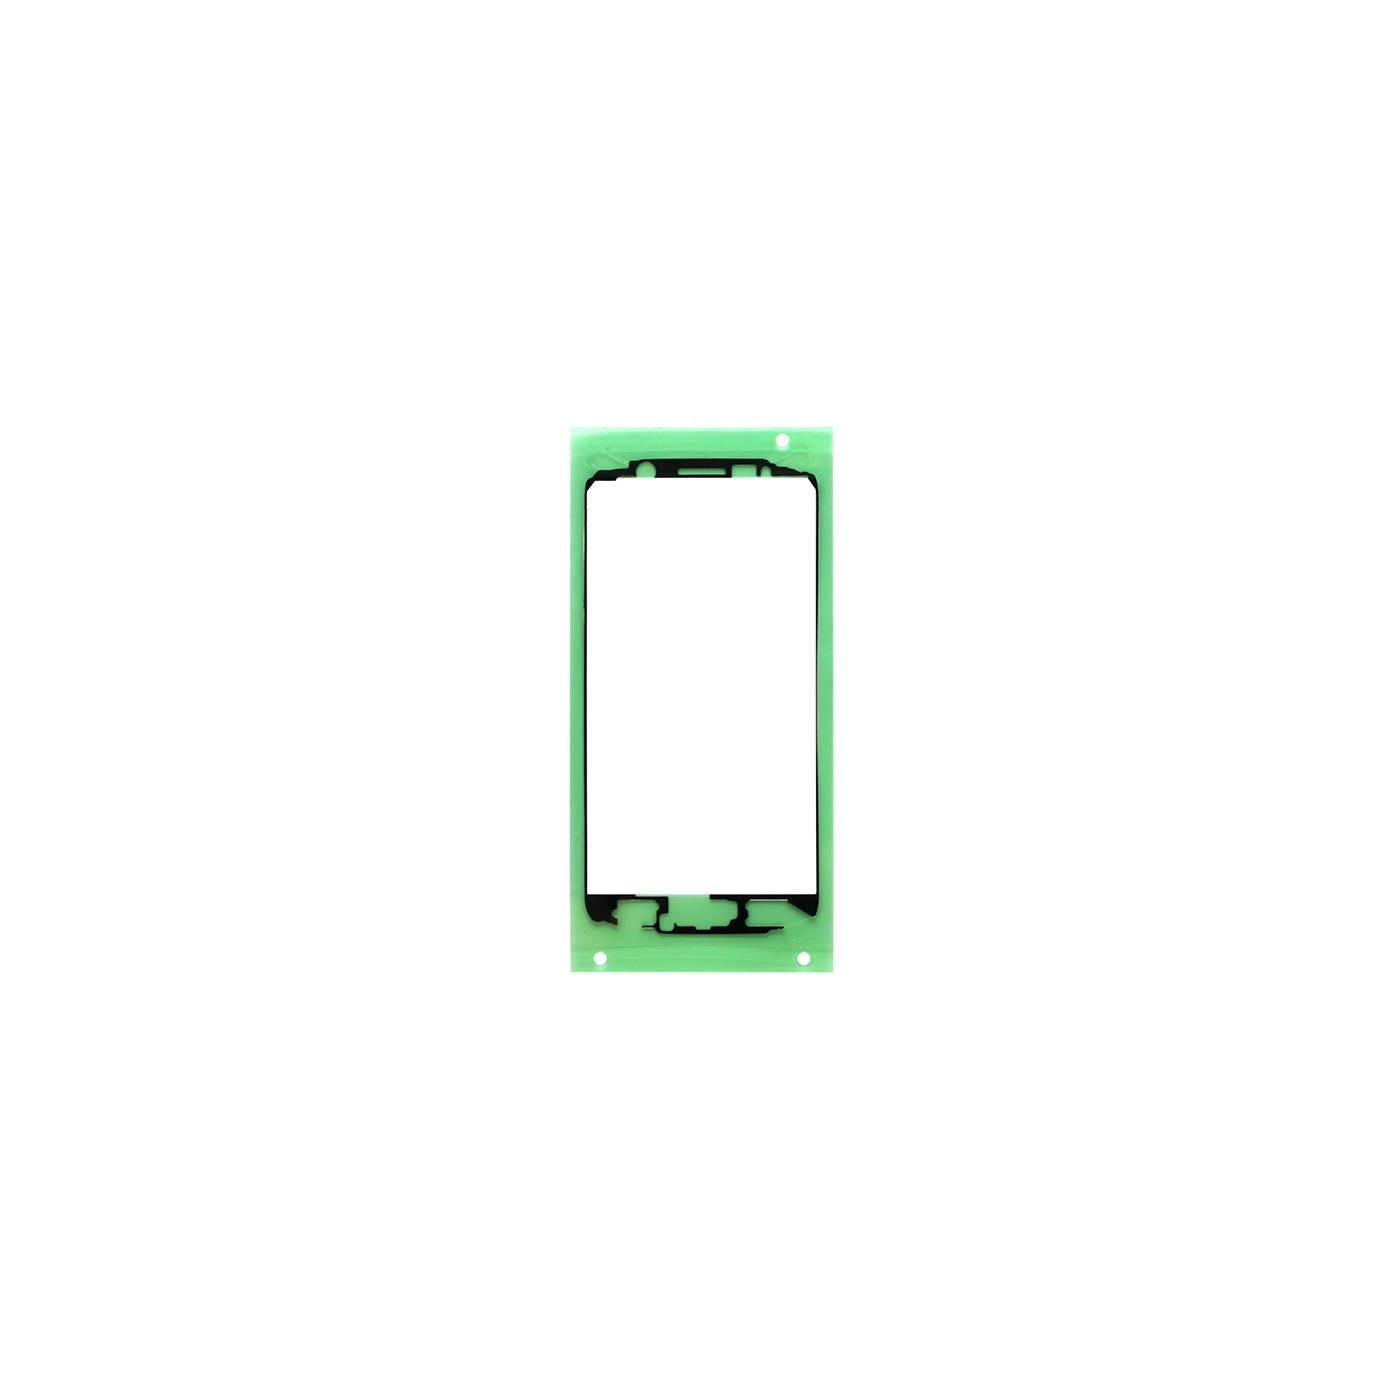 Biadesivo per vetro Samsung Galaxy S6 touch screen display